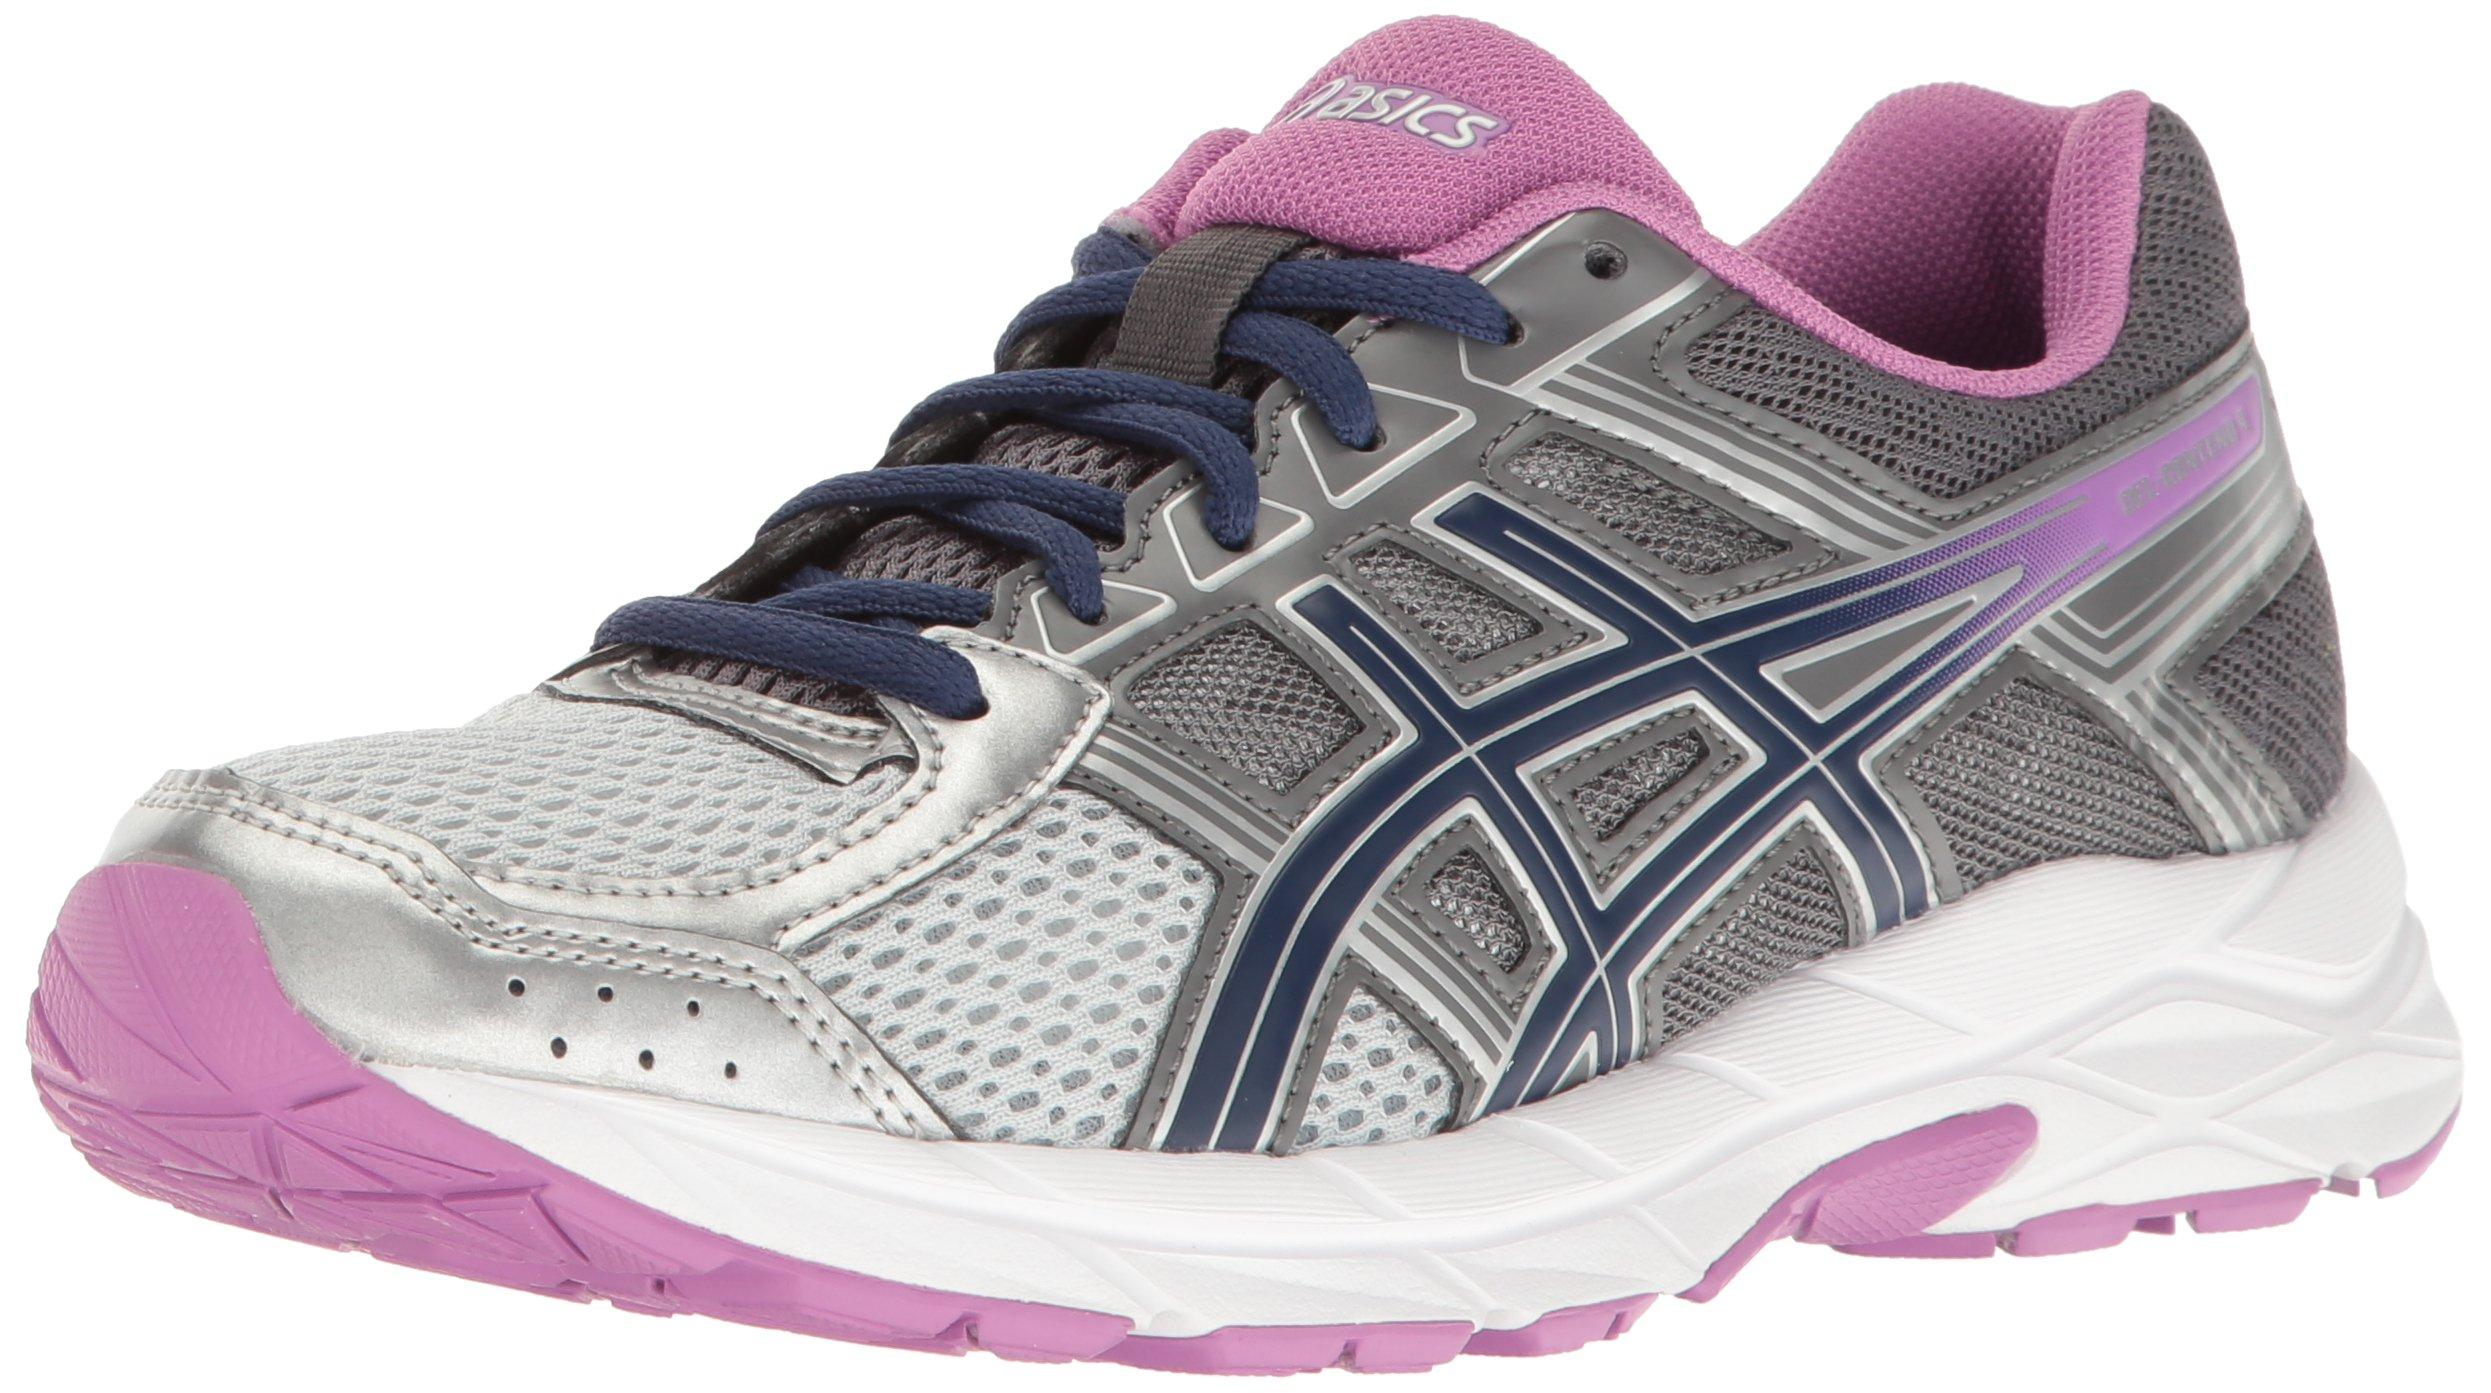 Womens Gel-Contend 4 Running Shoe- Buy